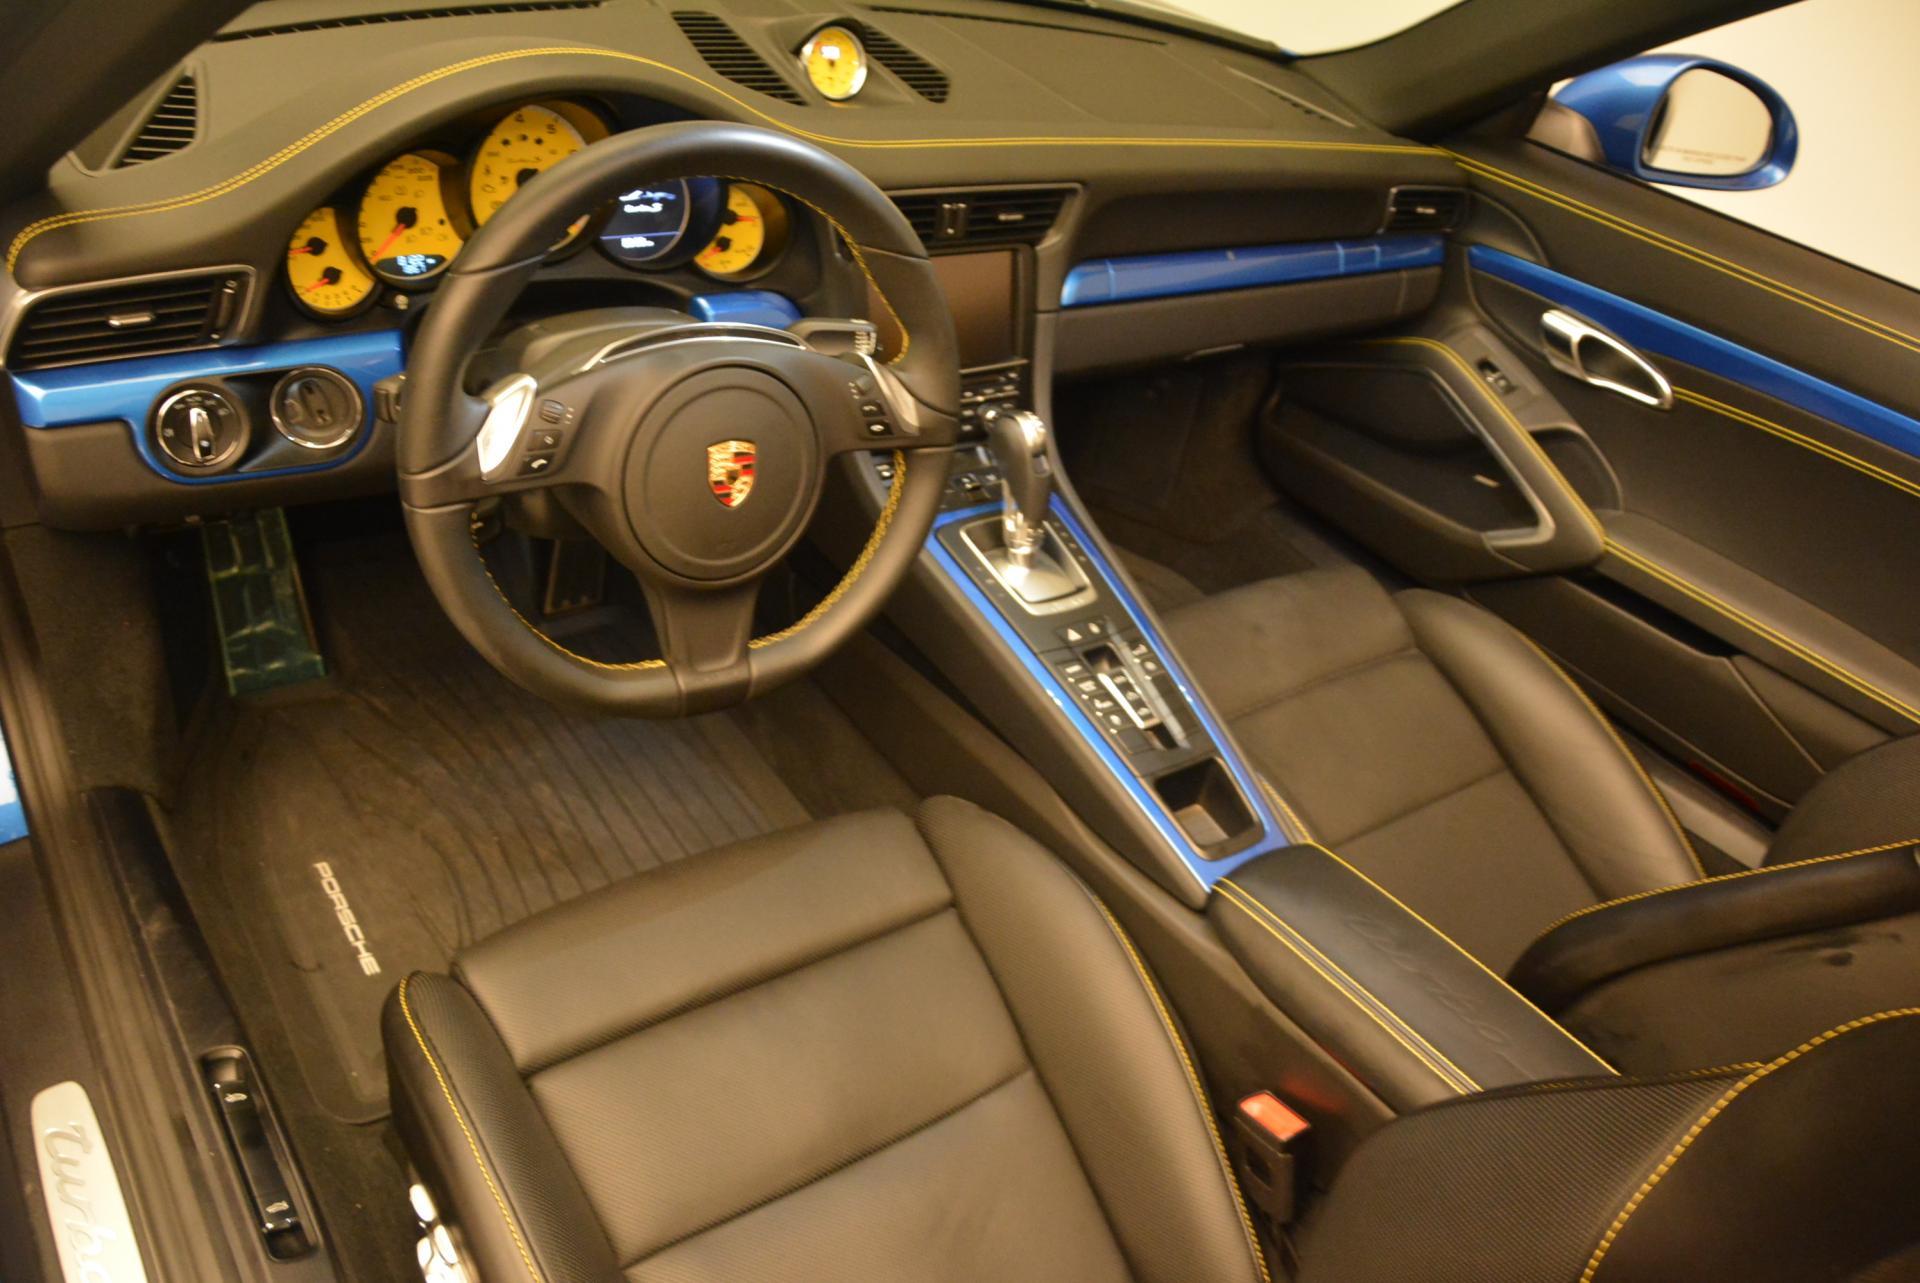 Used 2014 Porsche 911 Turbo S For Sale In Greenwich, CT 105_p18